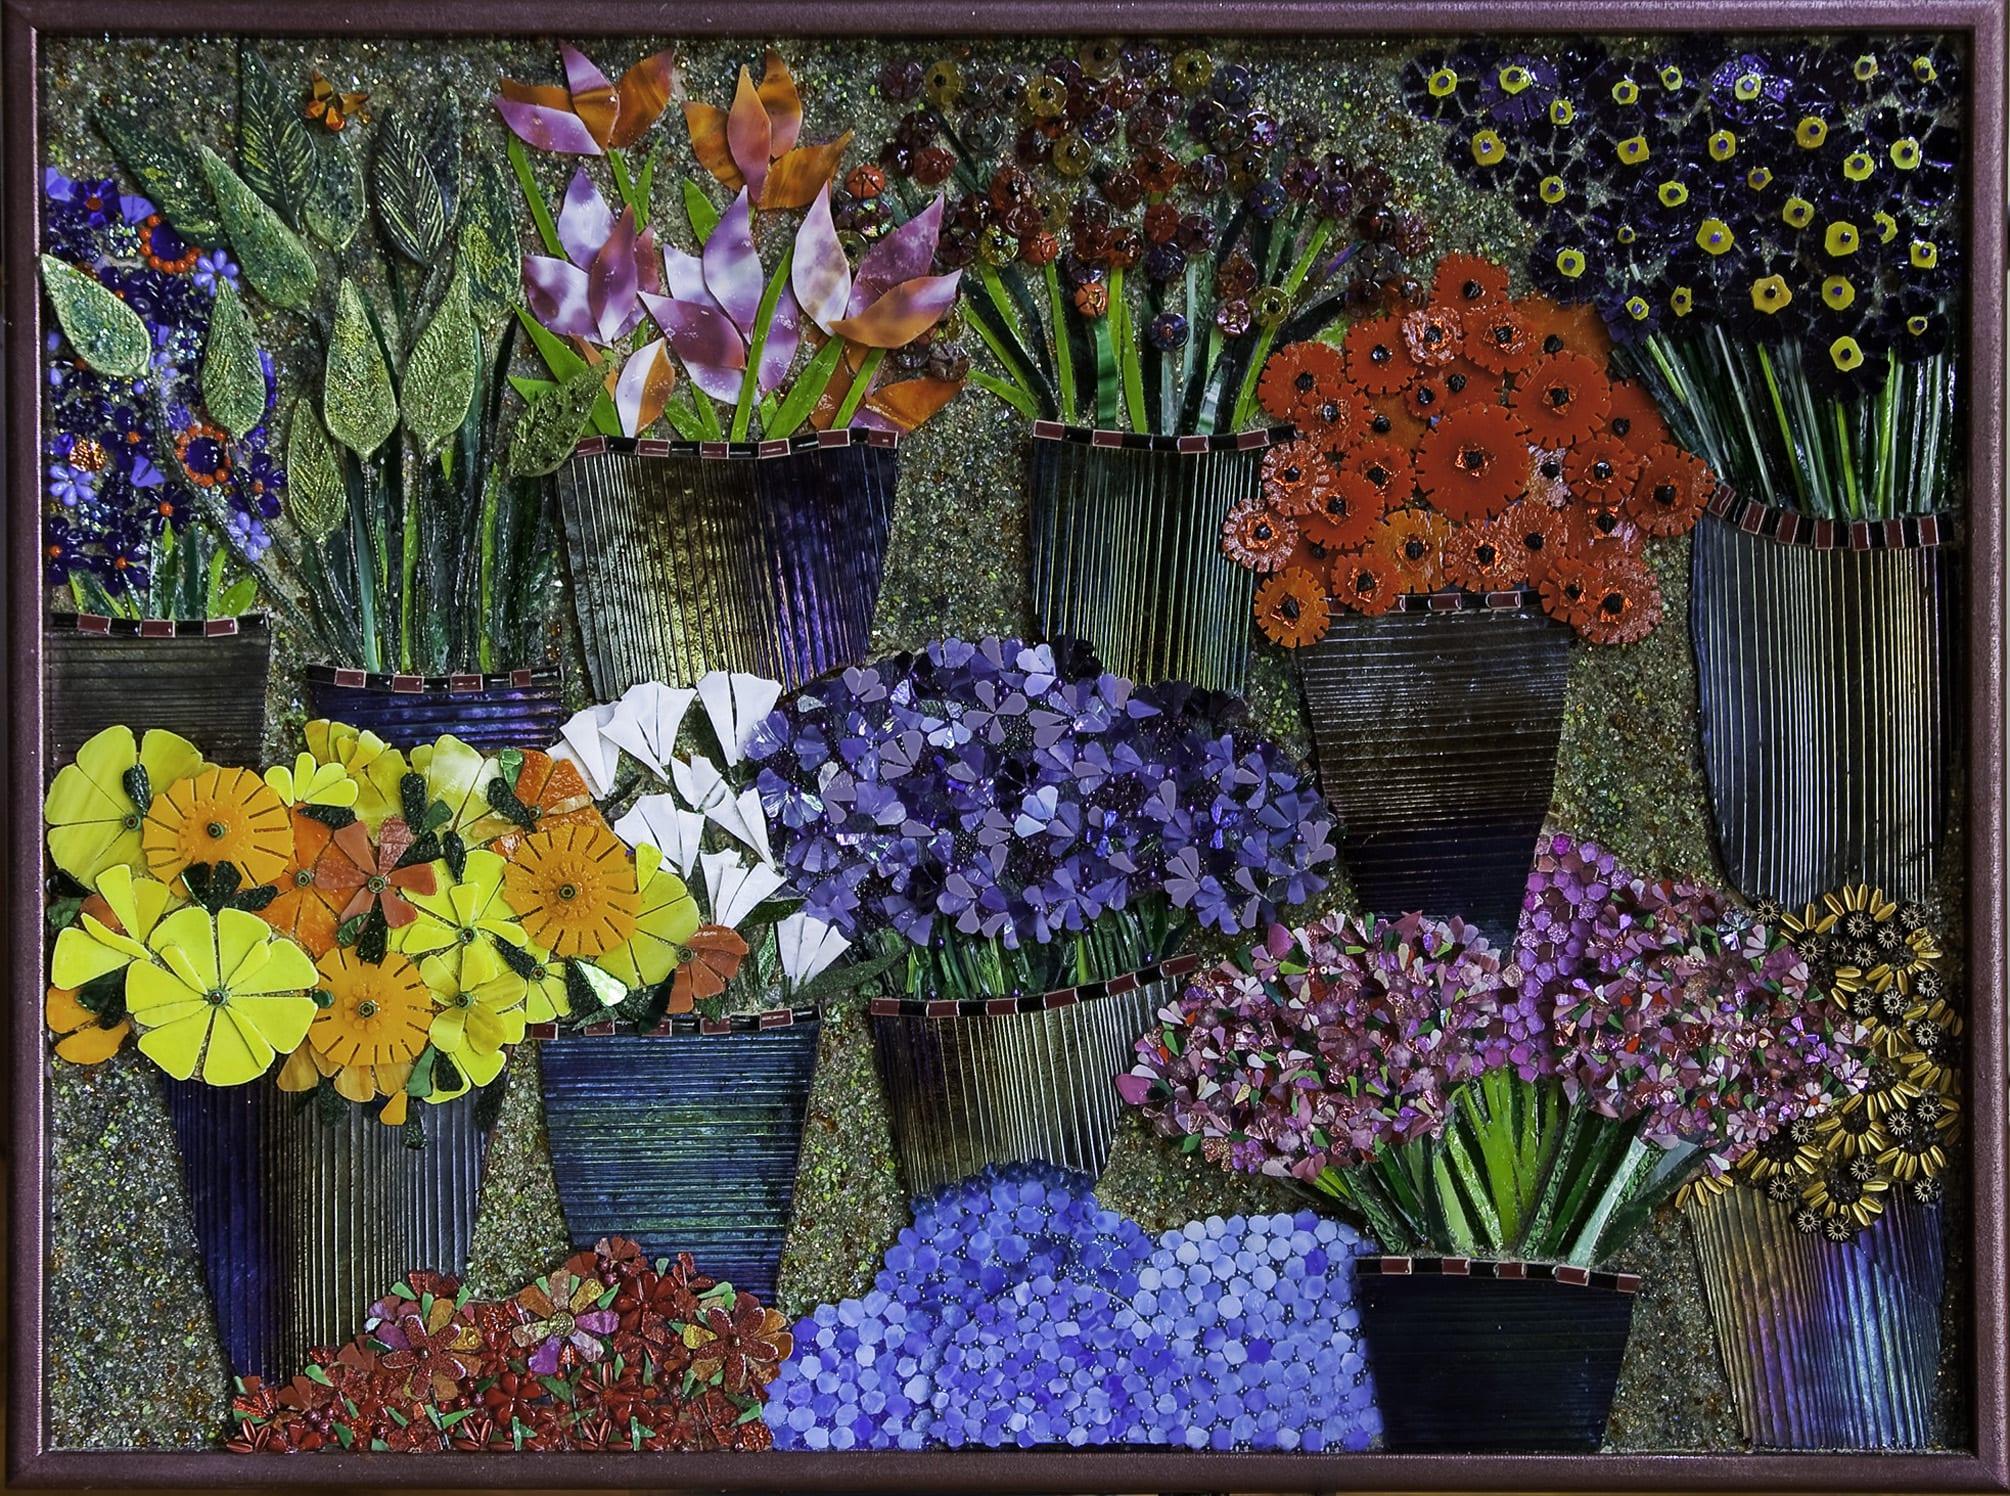 """At the Flower Market"" by Morrine Maltzman"